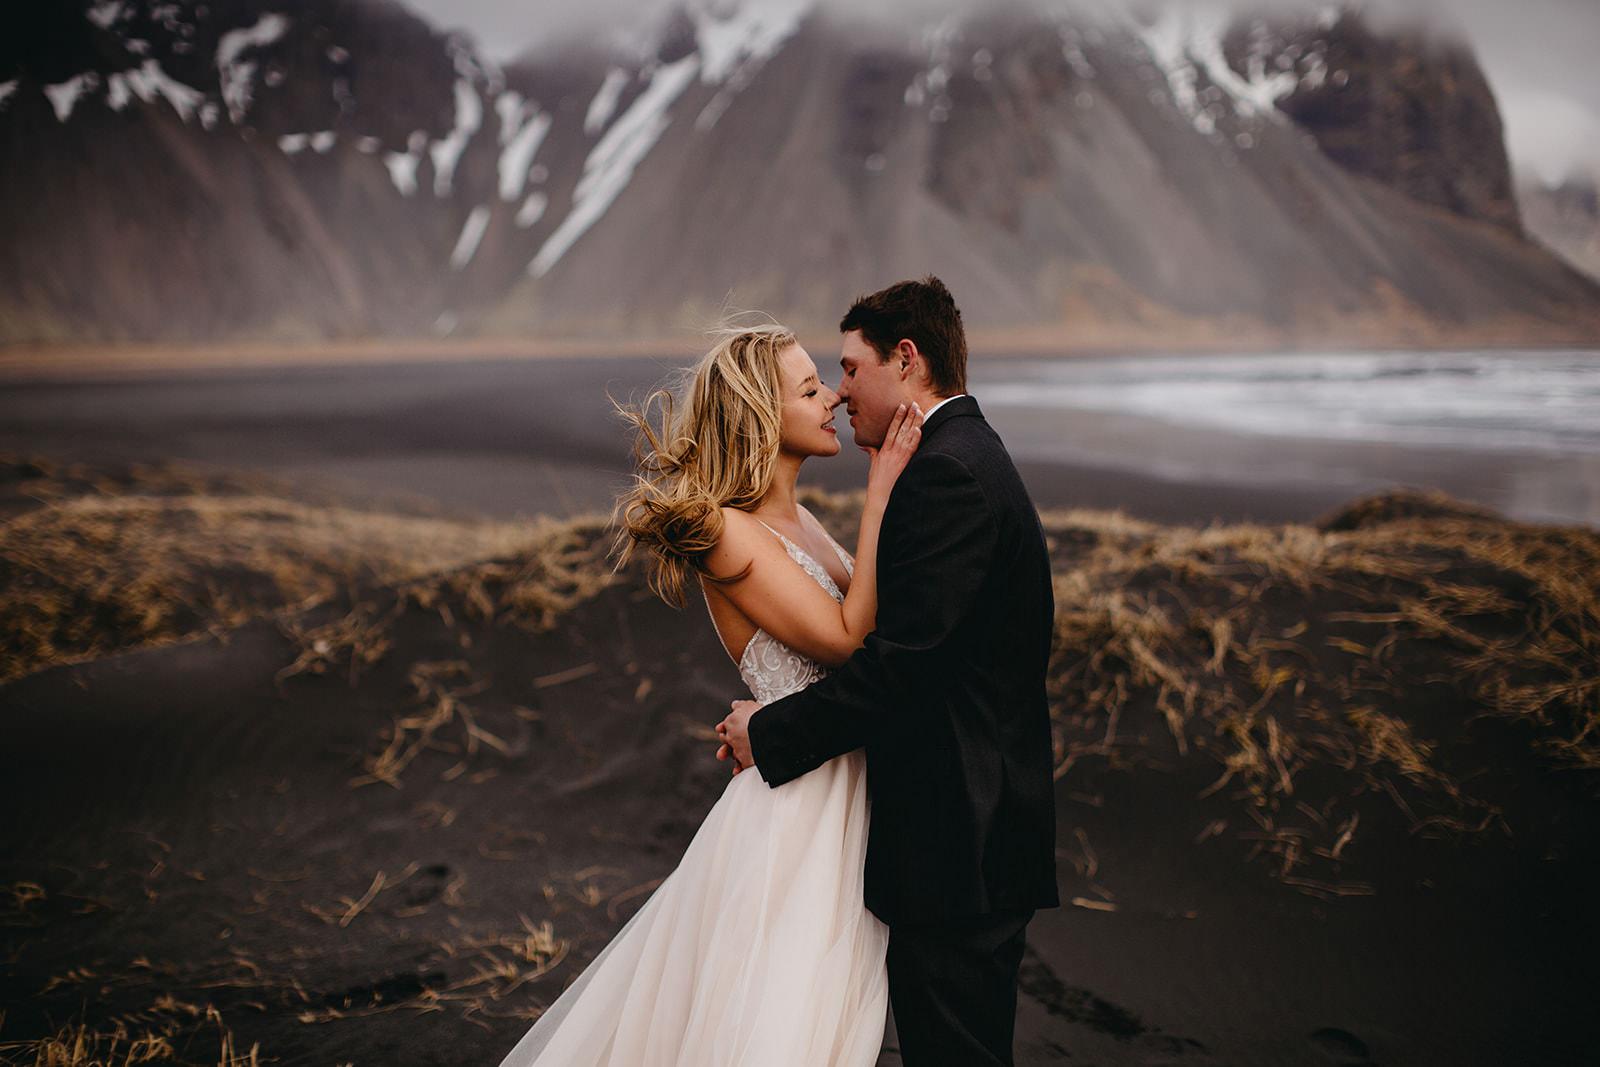 Icelandic Iceland Elopement Wedding Elope Photographer Eloping Reykjavík Vik Black Sand Beach Jökulsárlón Skogafoss Waterfall Vestrahorn Mountain Liz Osban Photography Destination 37.jpg